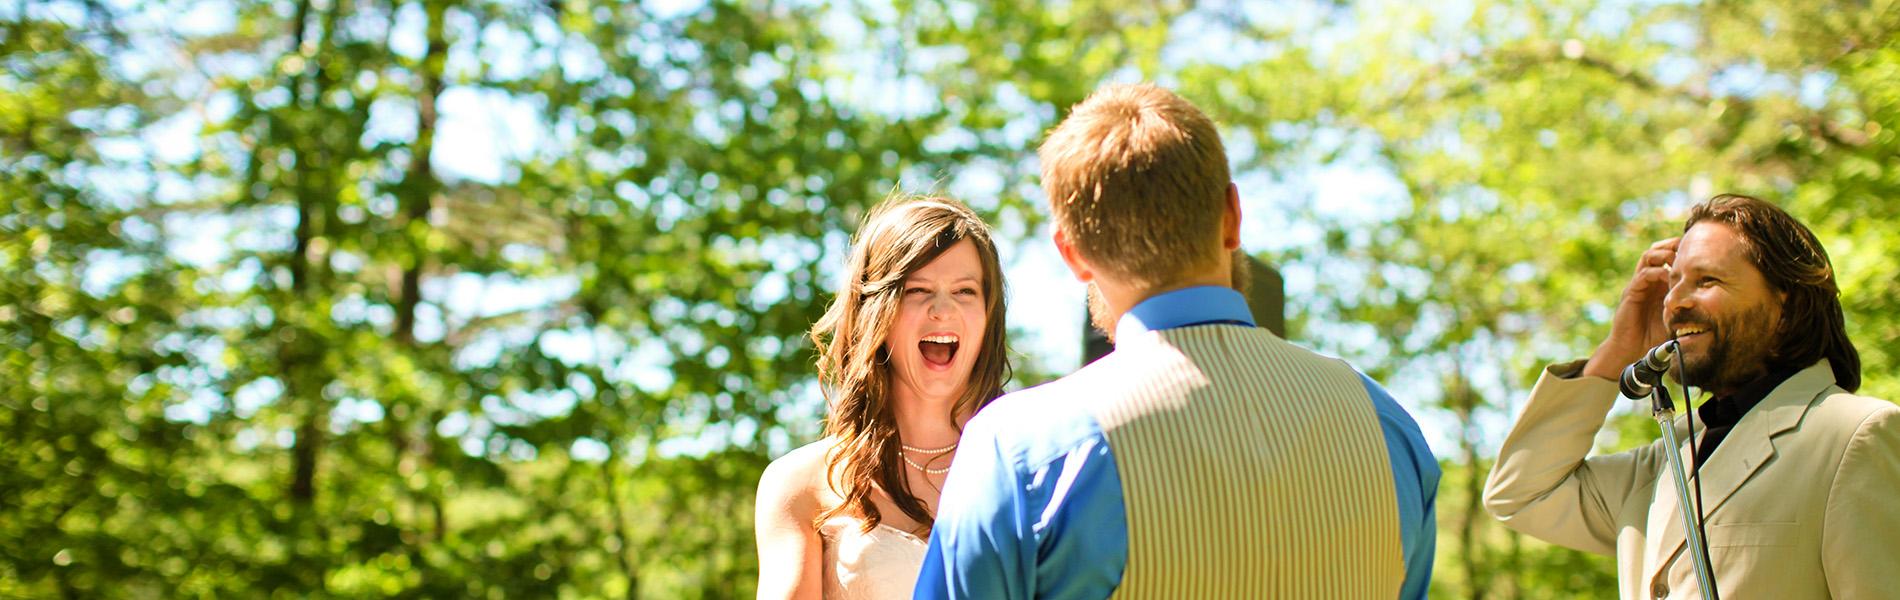 Wedding Ceremony at Cloudland Canyon